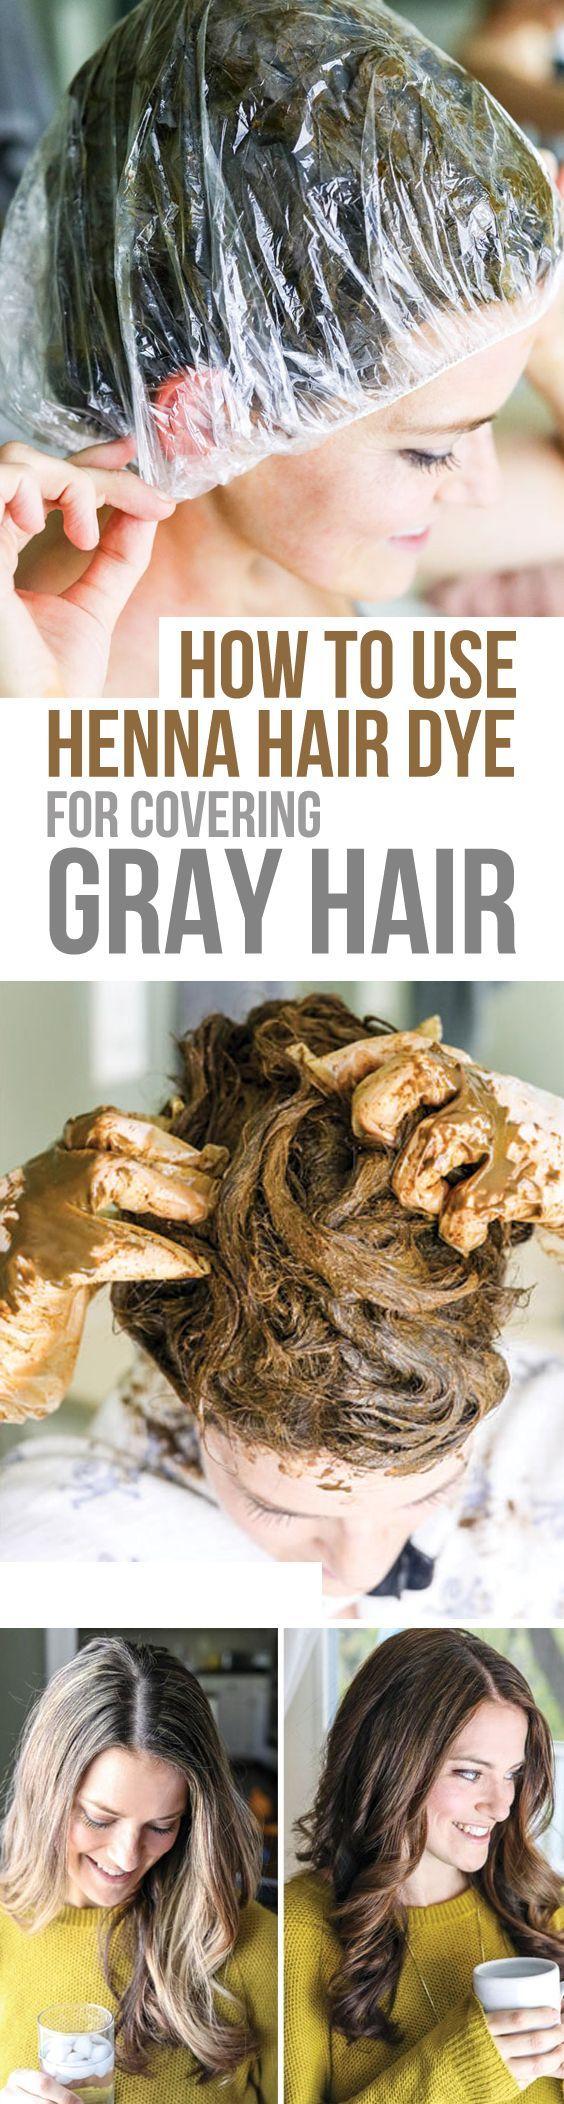 Henna Hair Dye for Covering Gray Hair